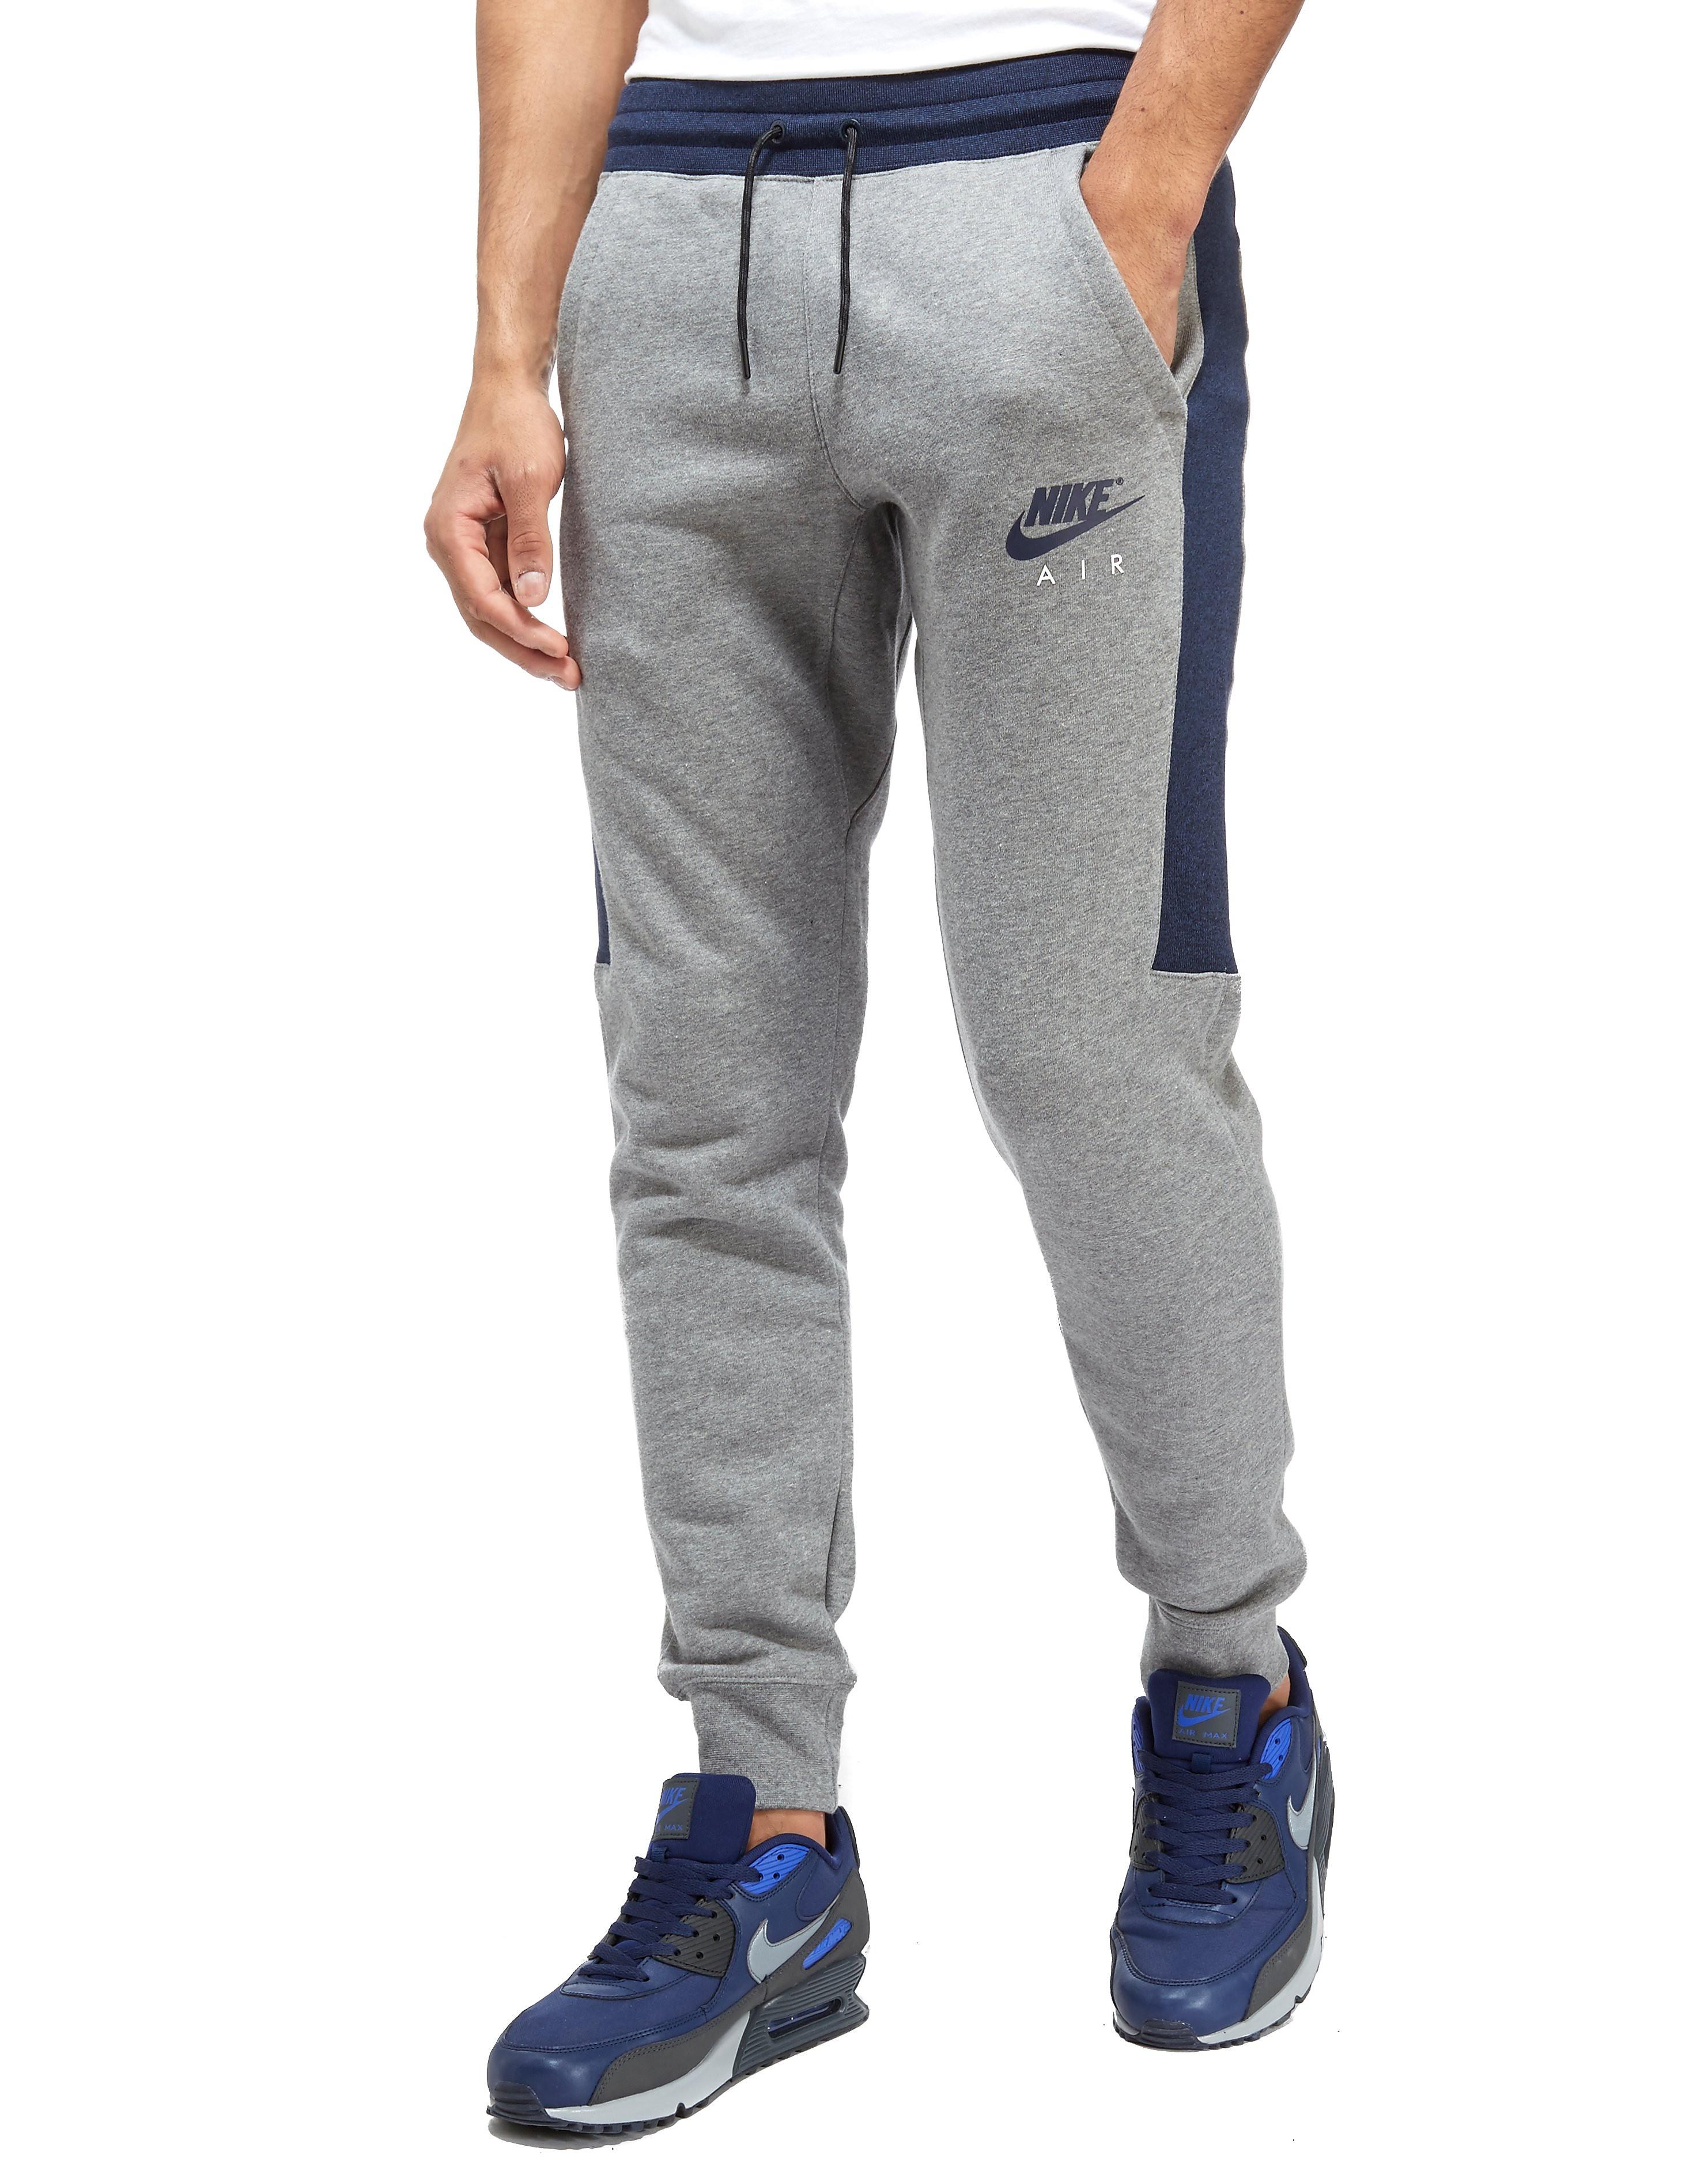 Nike Air Deep Cuff Fleece Pants